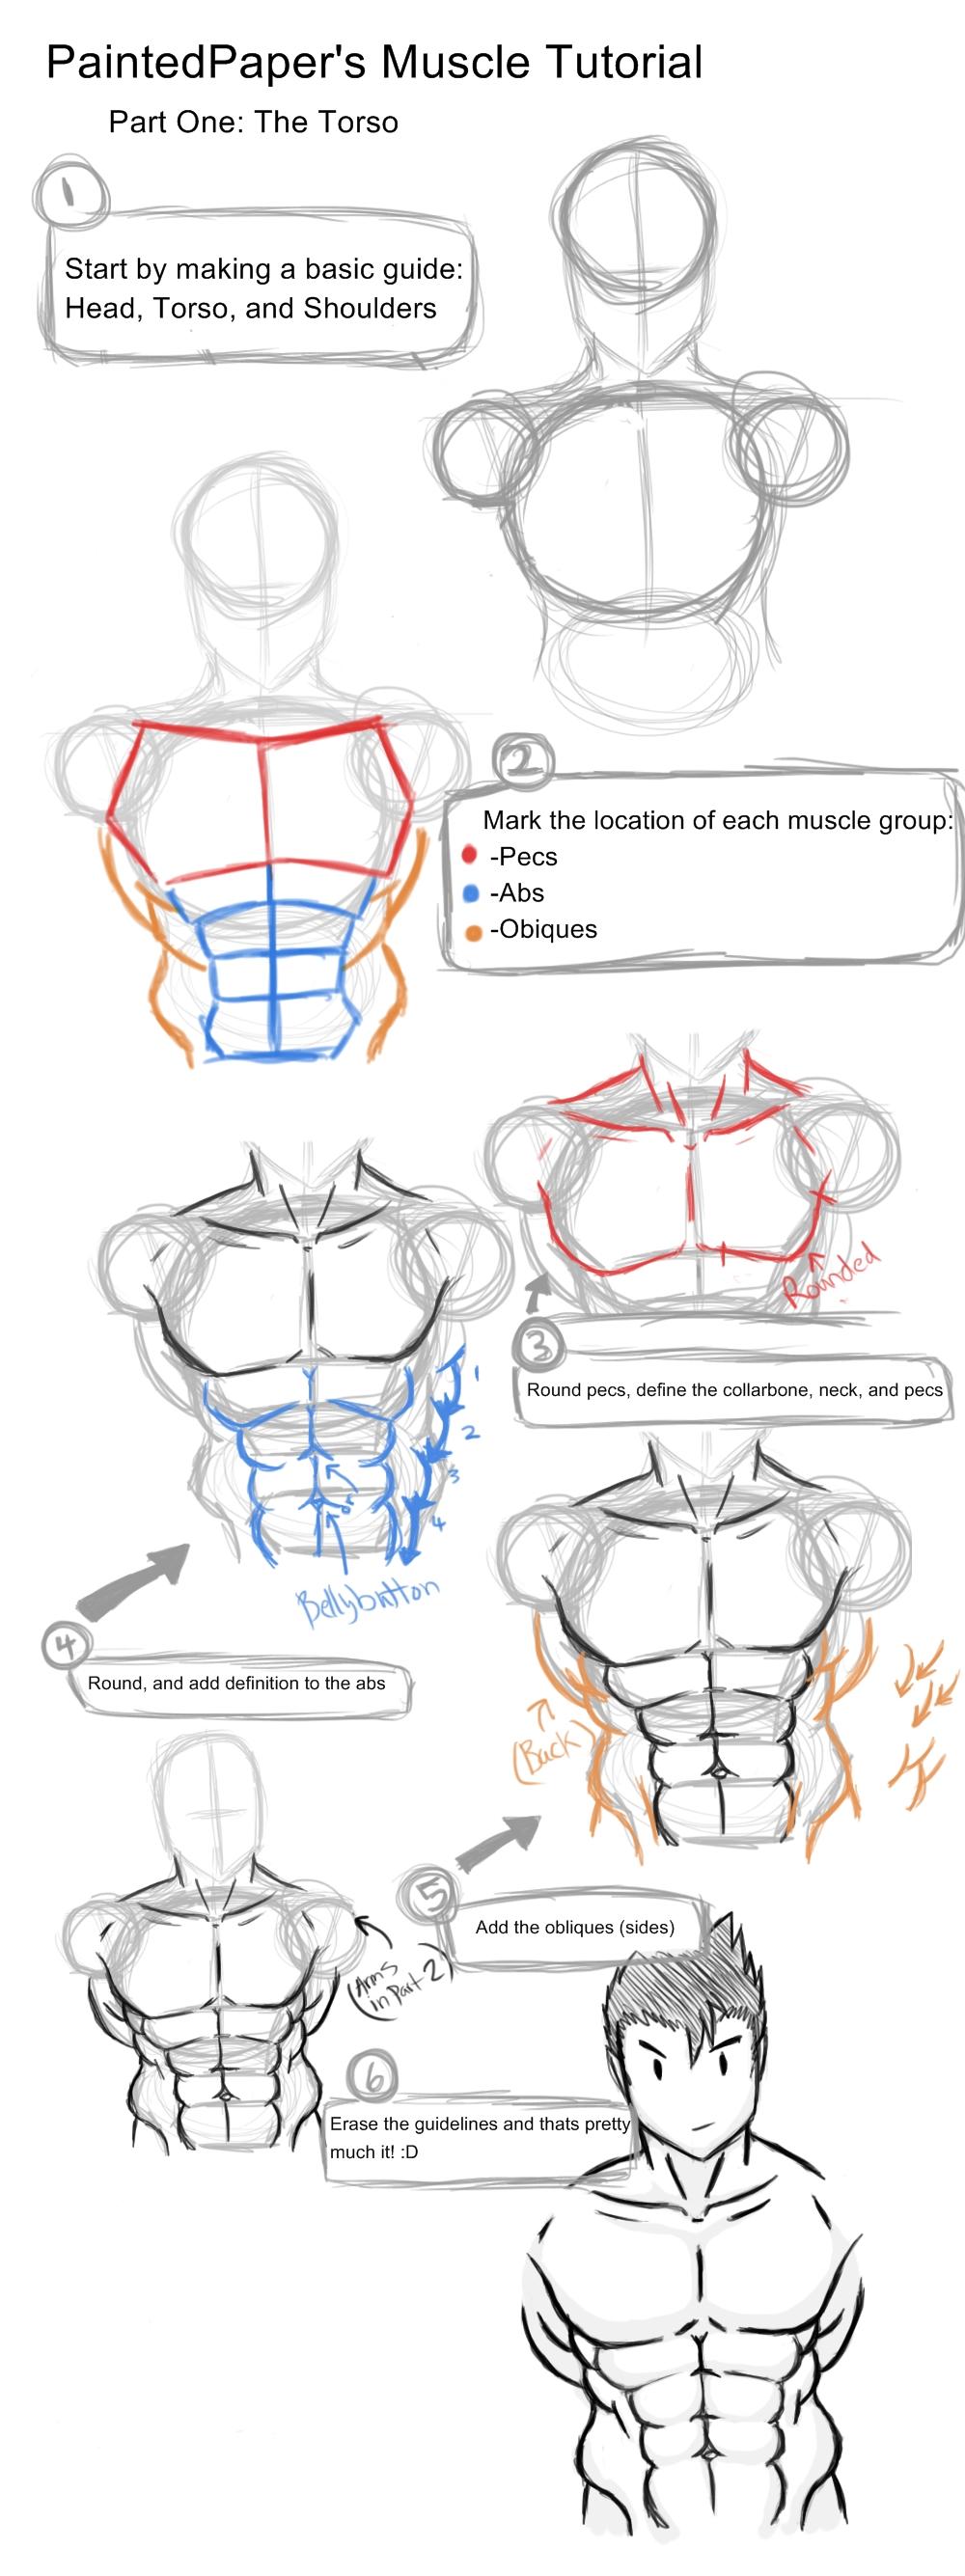 Big Muscles Tutorial - Part 1 by paintedpaper on DeviantArt